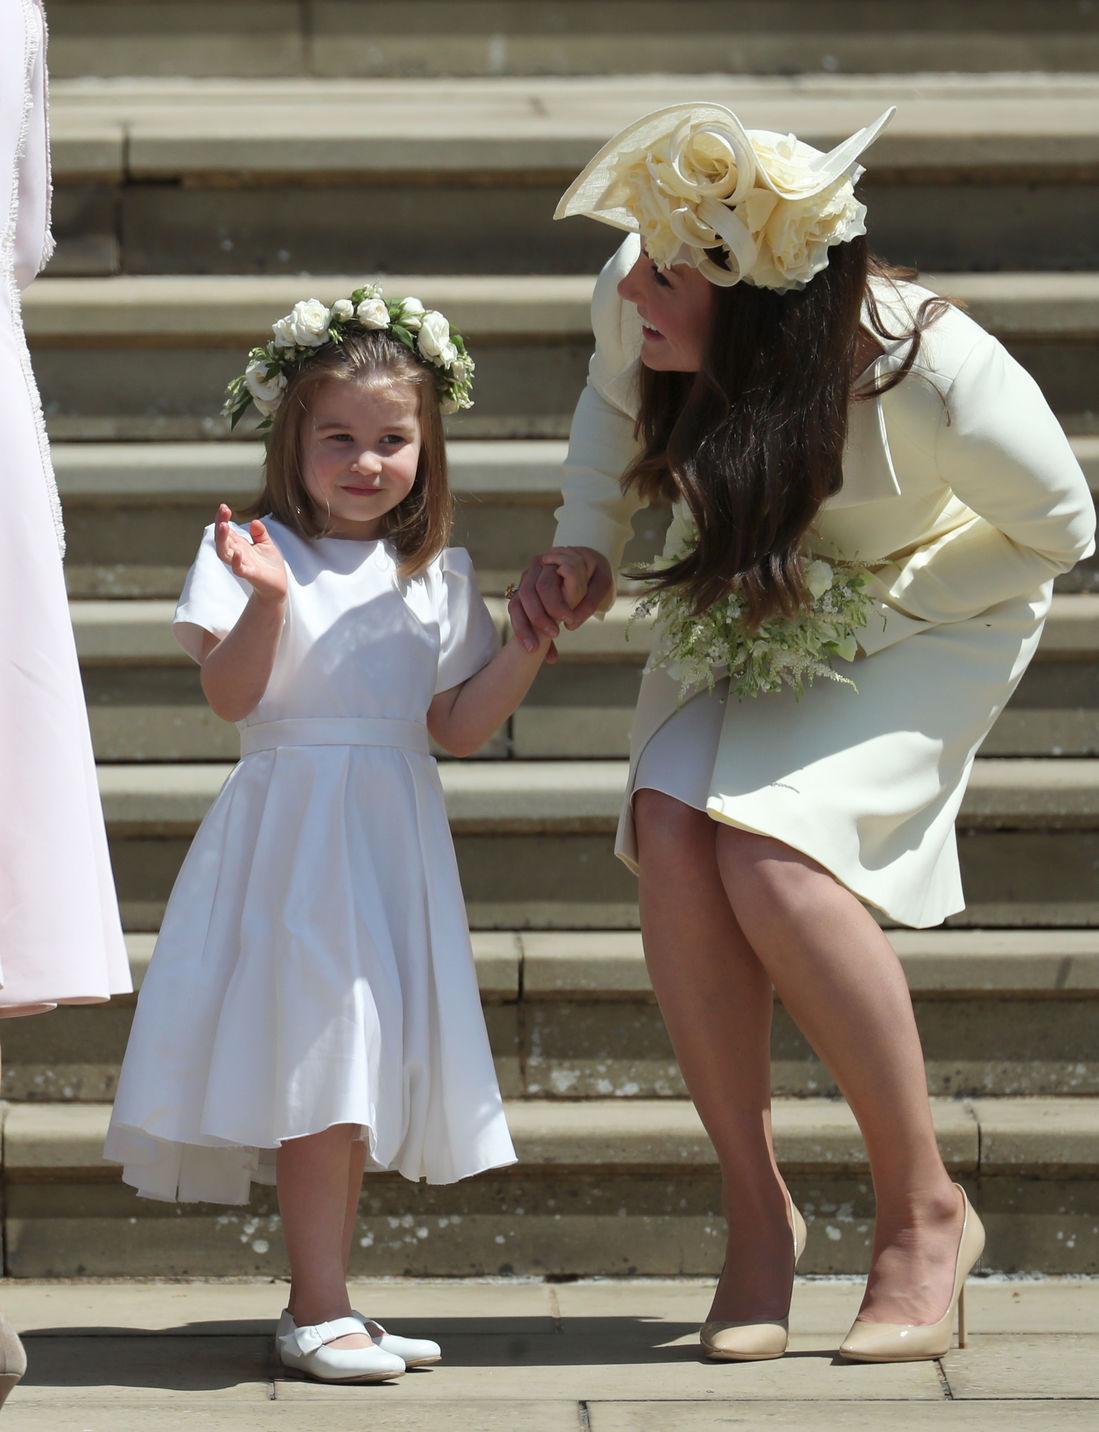 Sarolta hercegnő és Katalin hercegné. Fotó: Getty Images